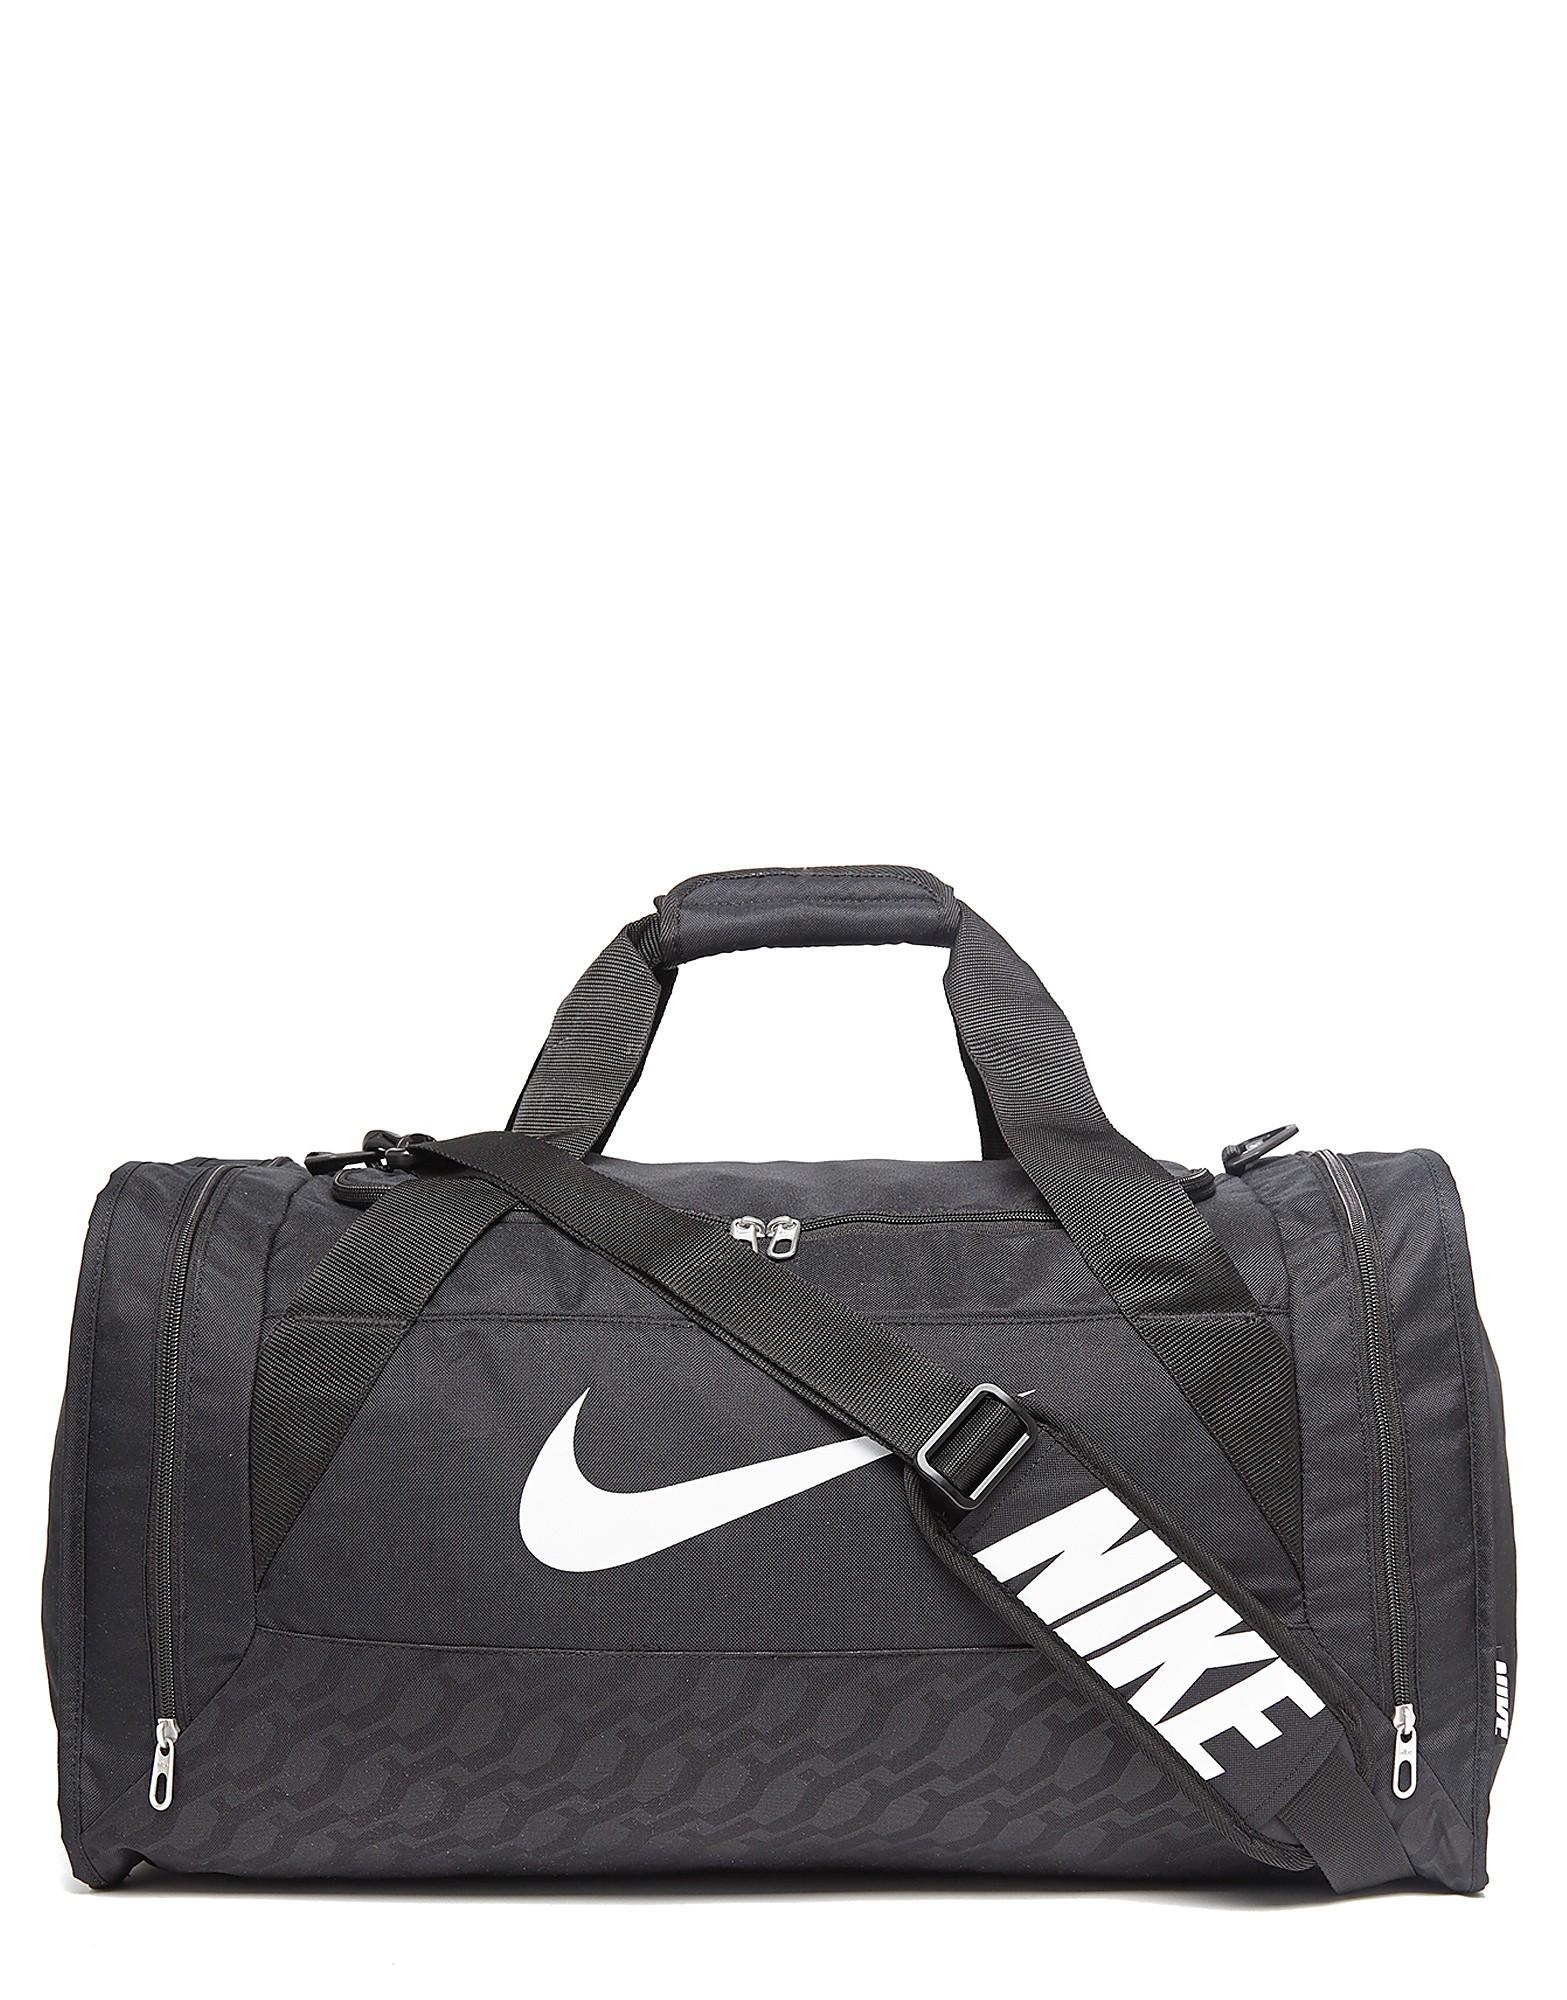 Nike Large Duffle Bag - Black - Mens, Black